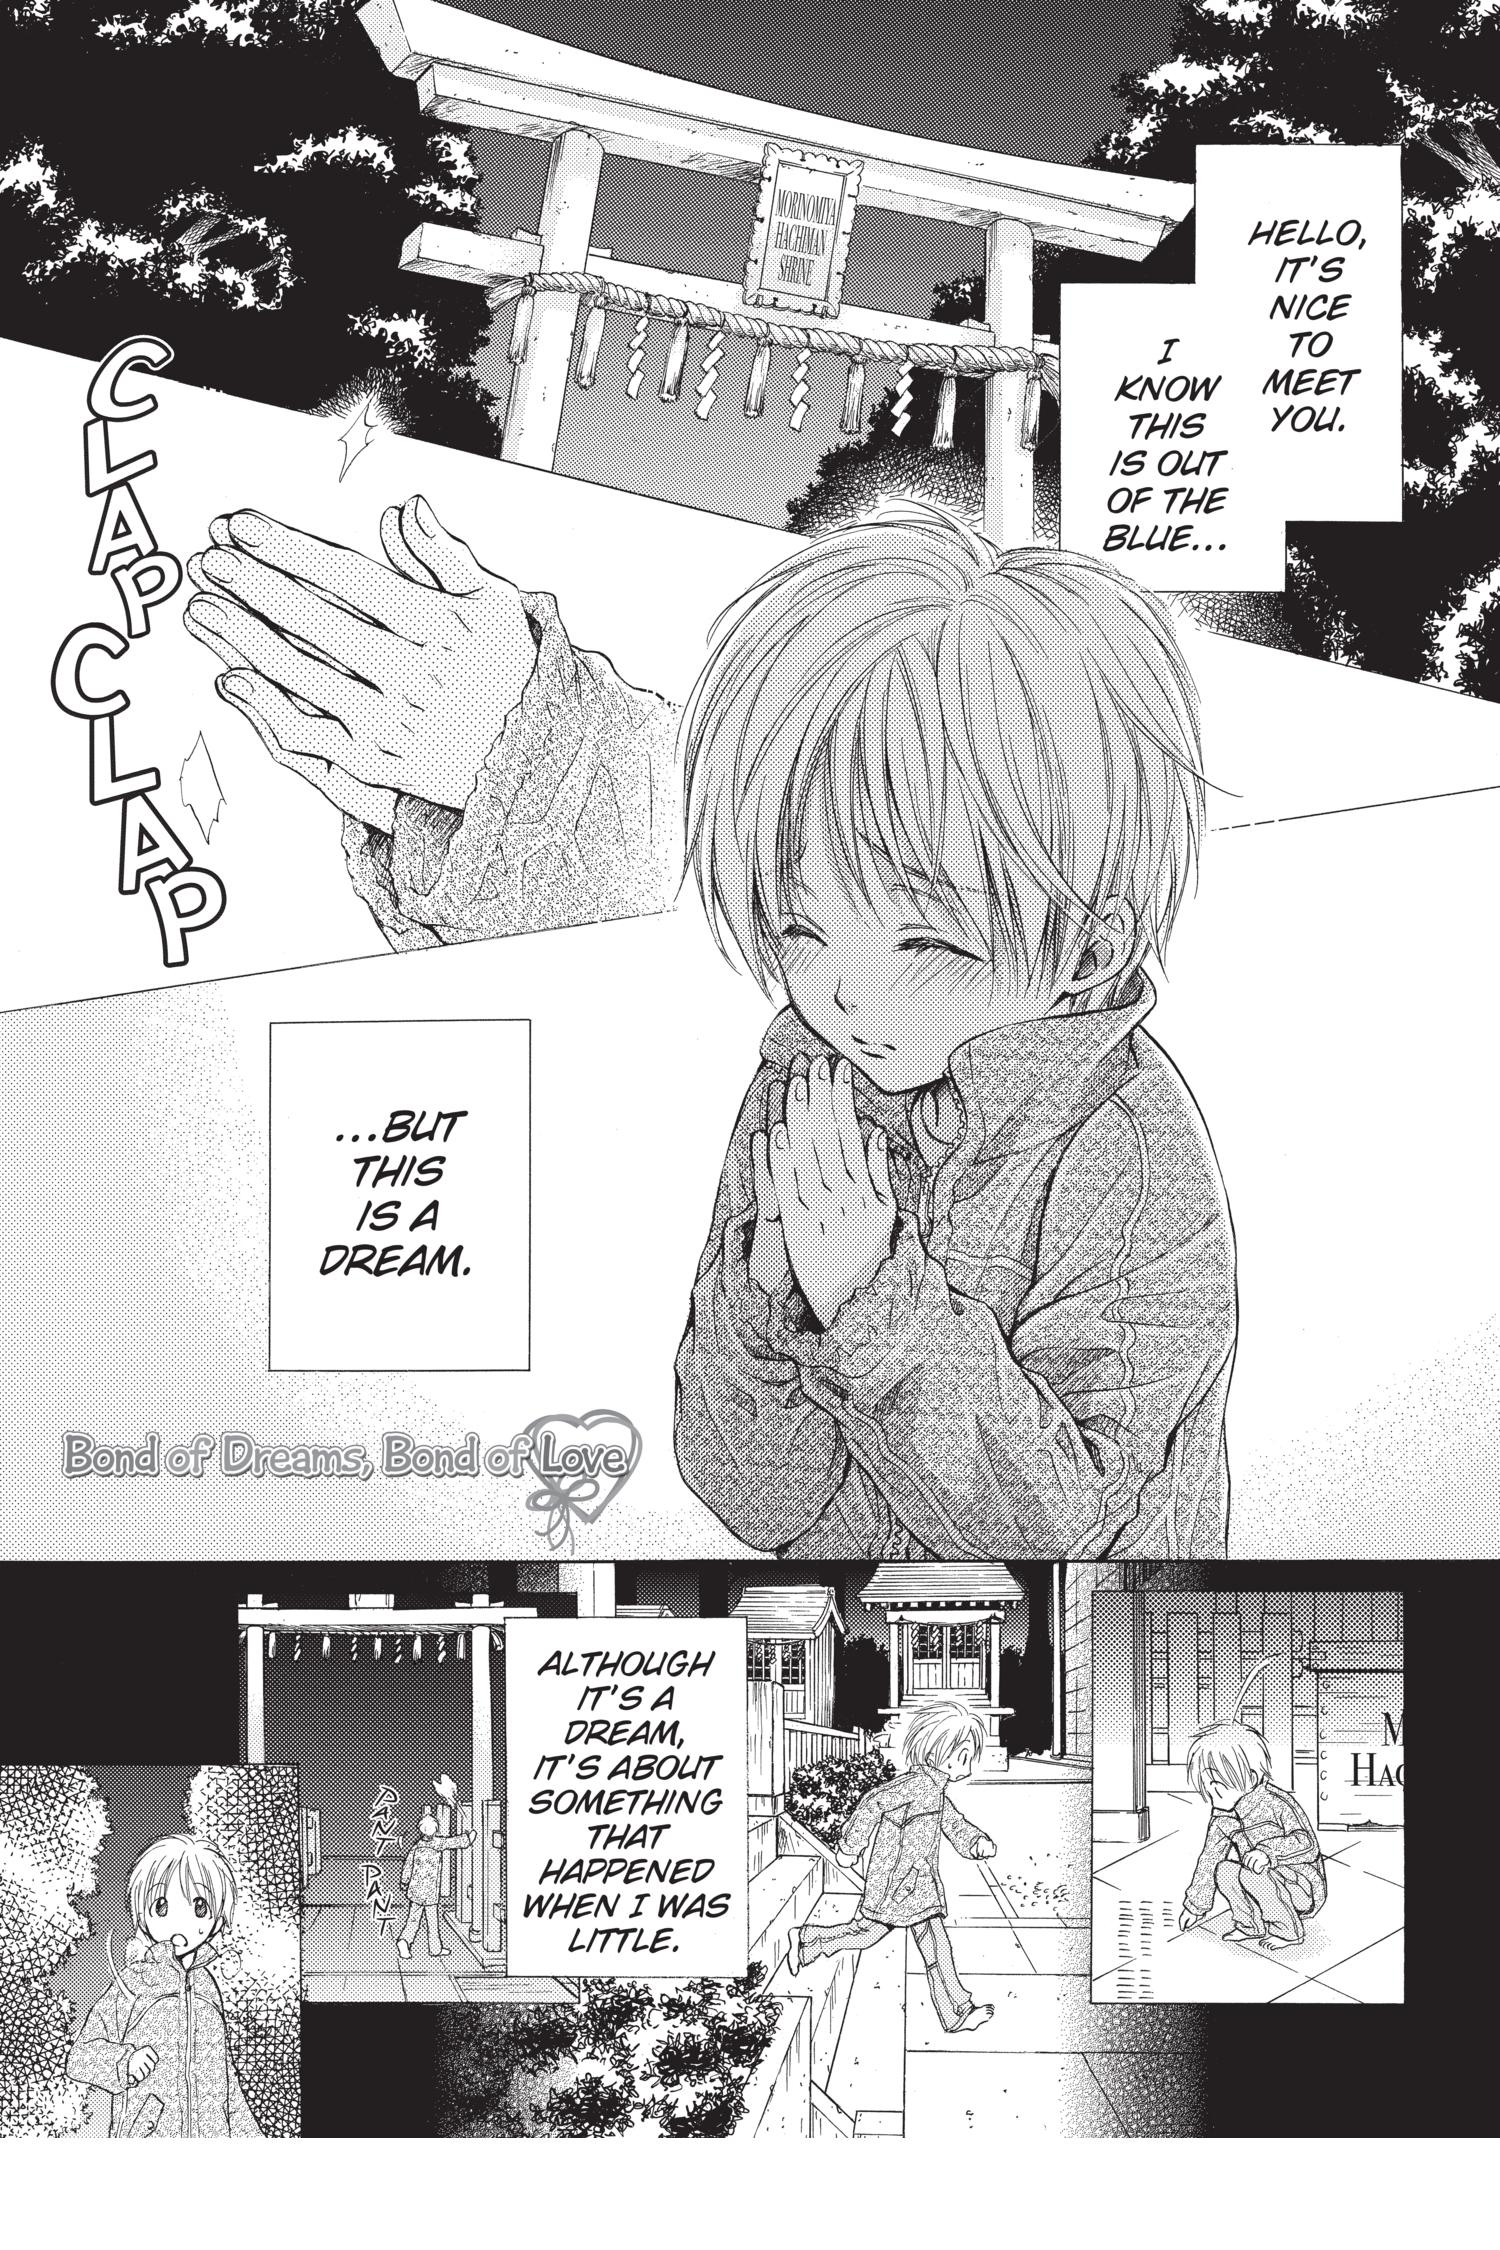 Bond of Dreams Bond of Love Manga Volume 1